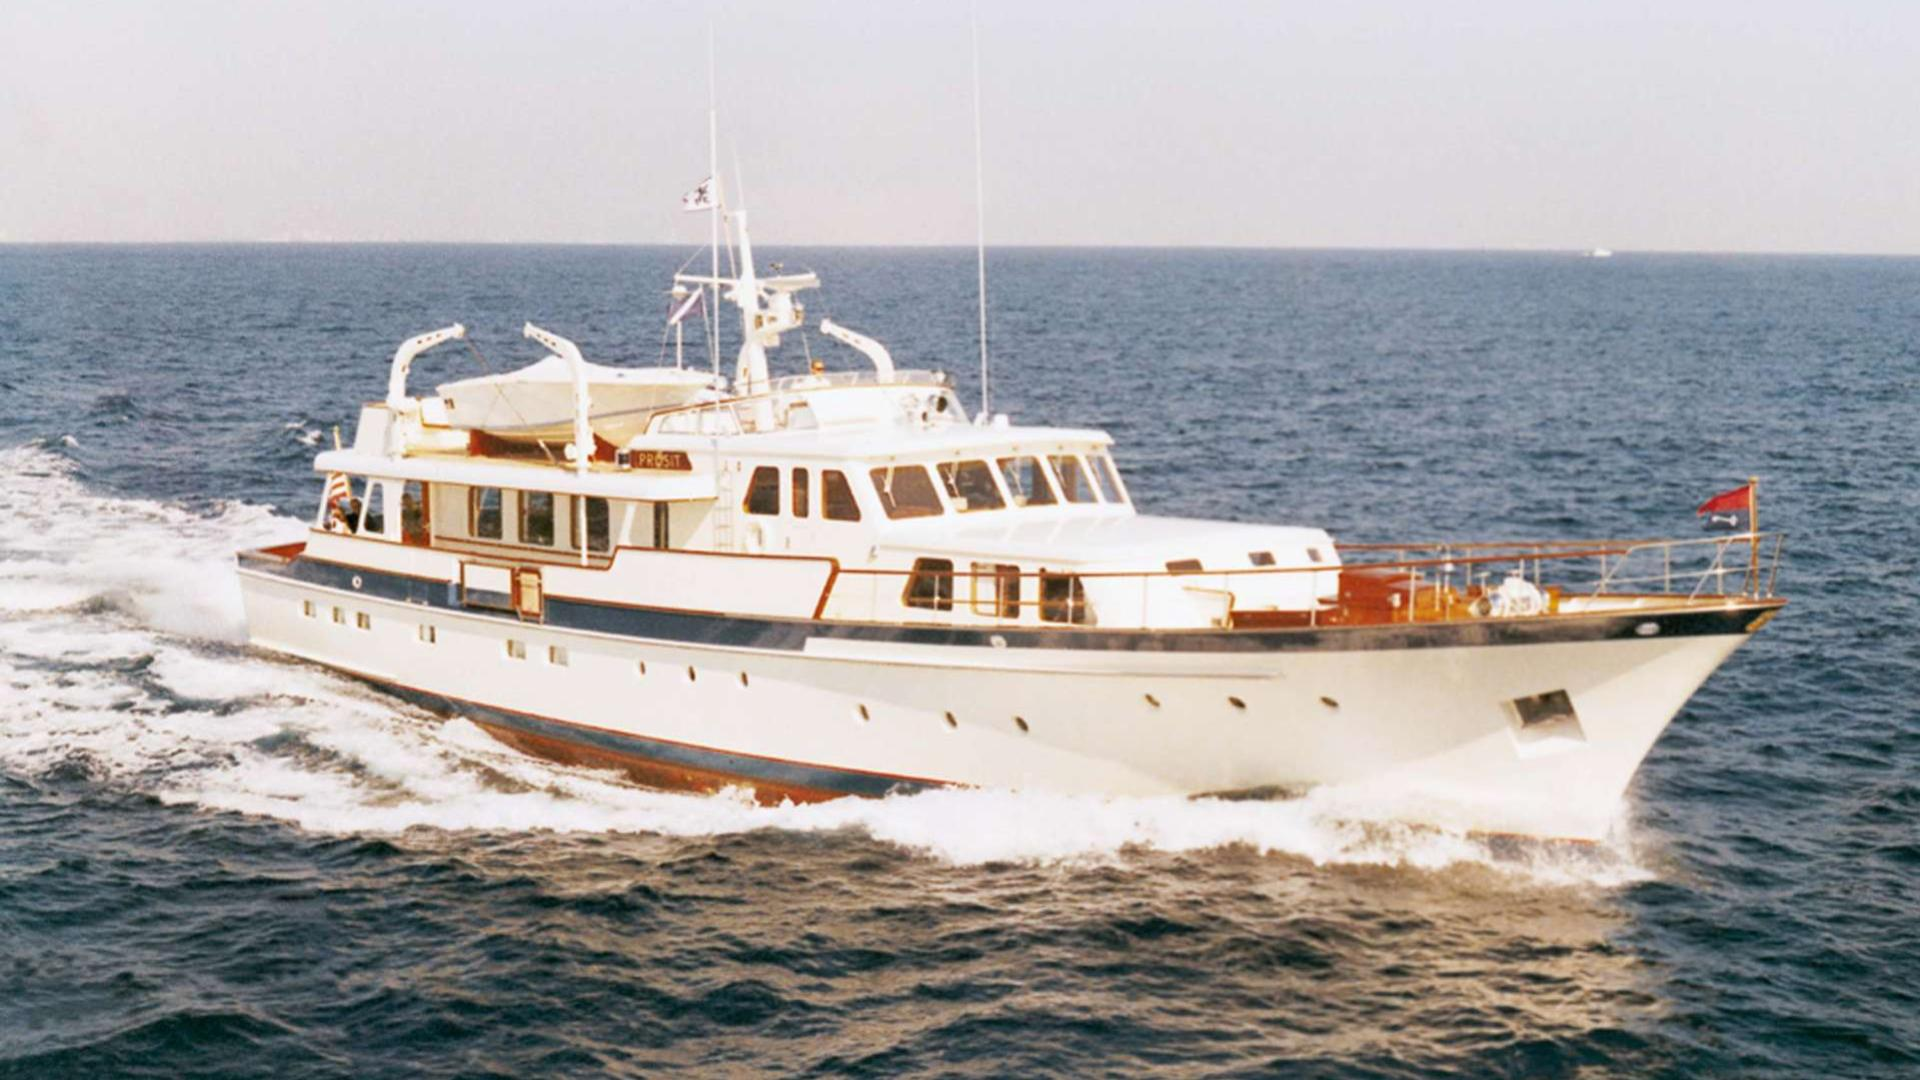 arcadia-intrepid-motor-yacht-feadship-1969-31m-cruising